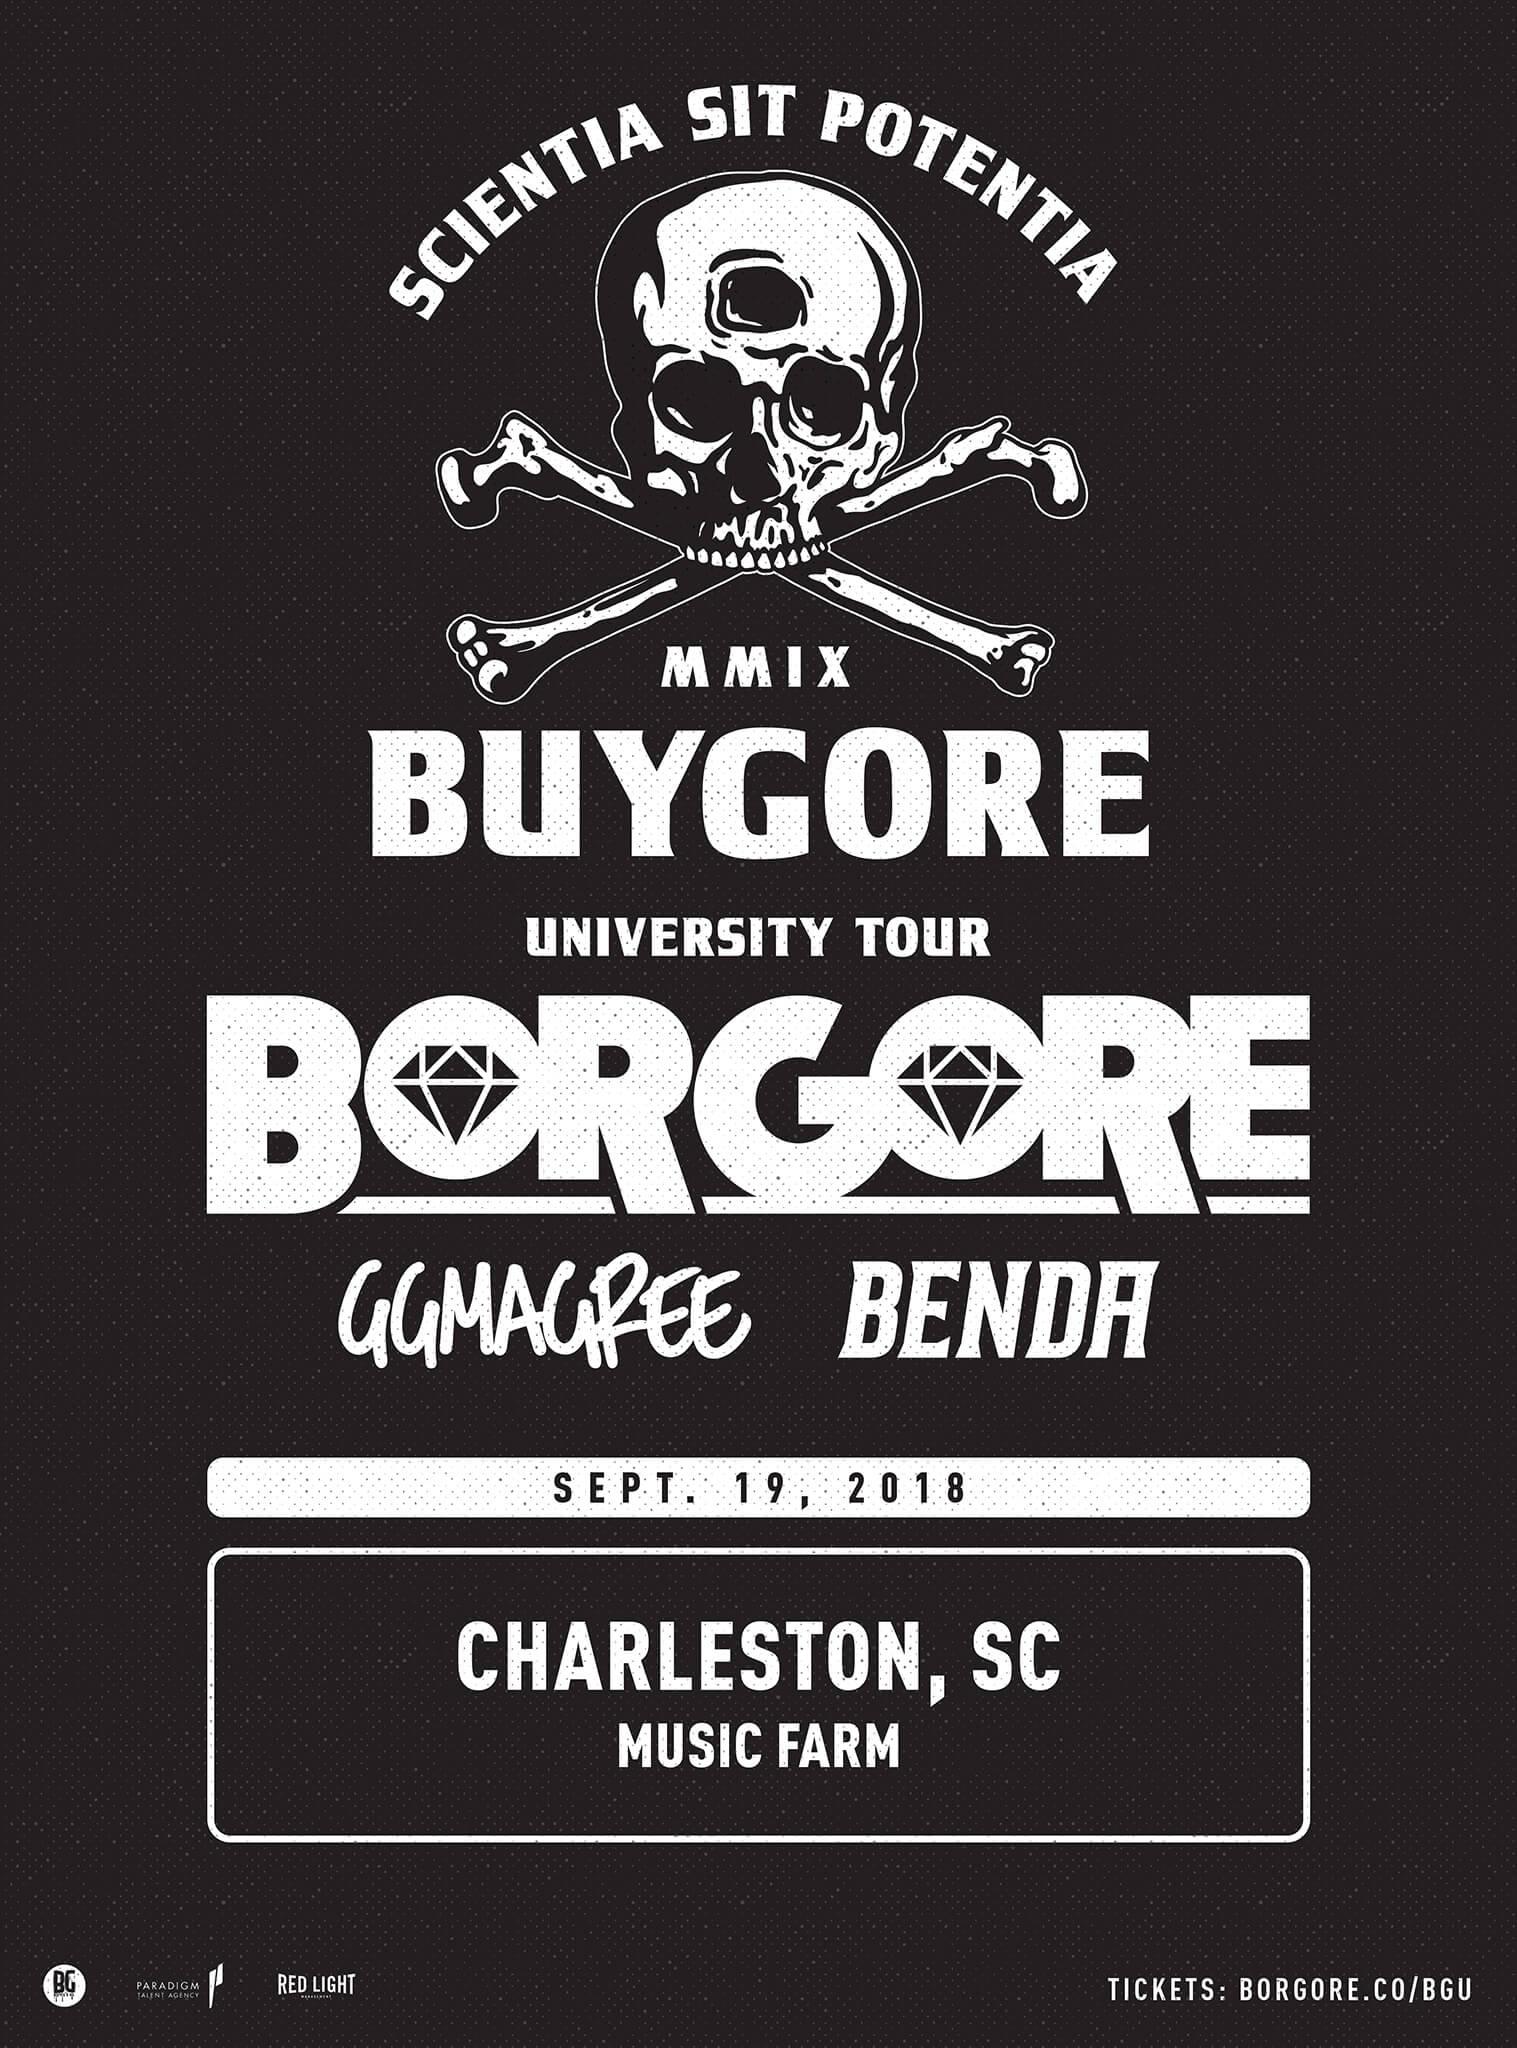 Borgore, GG Magree, Benda in Charleston